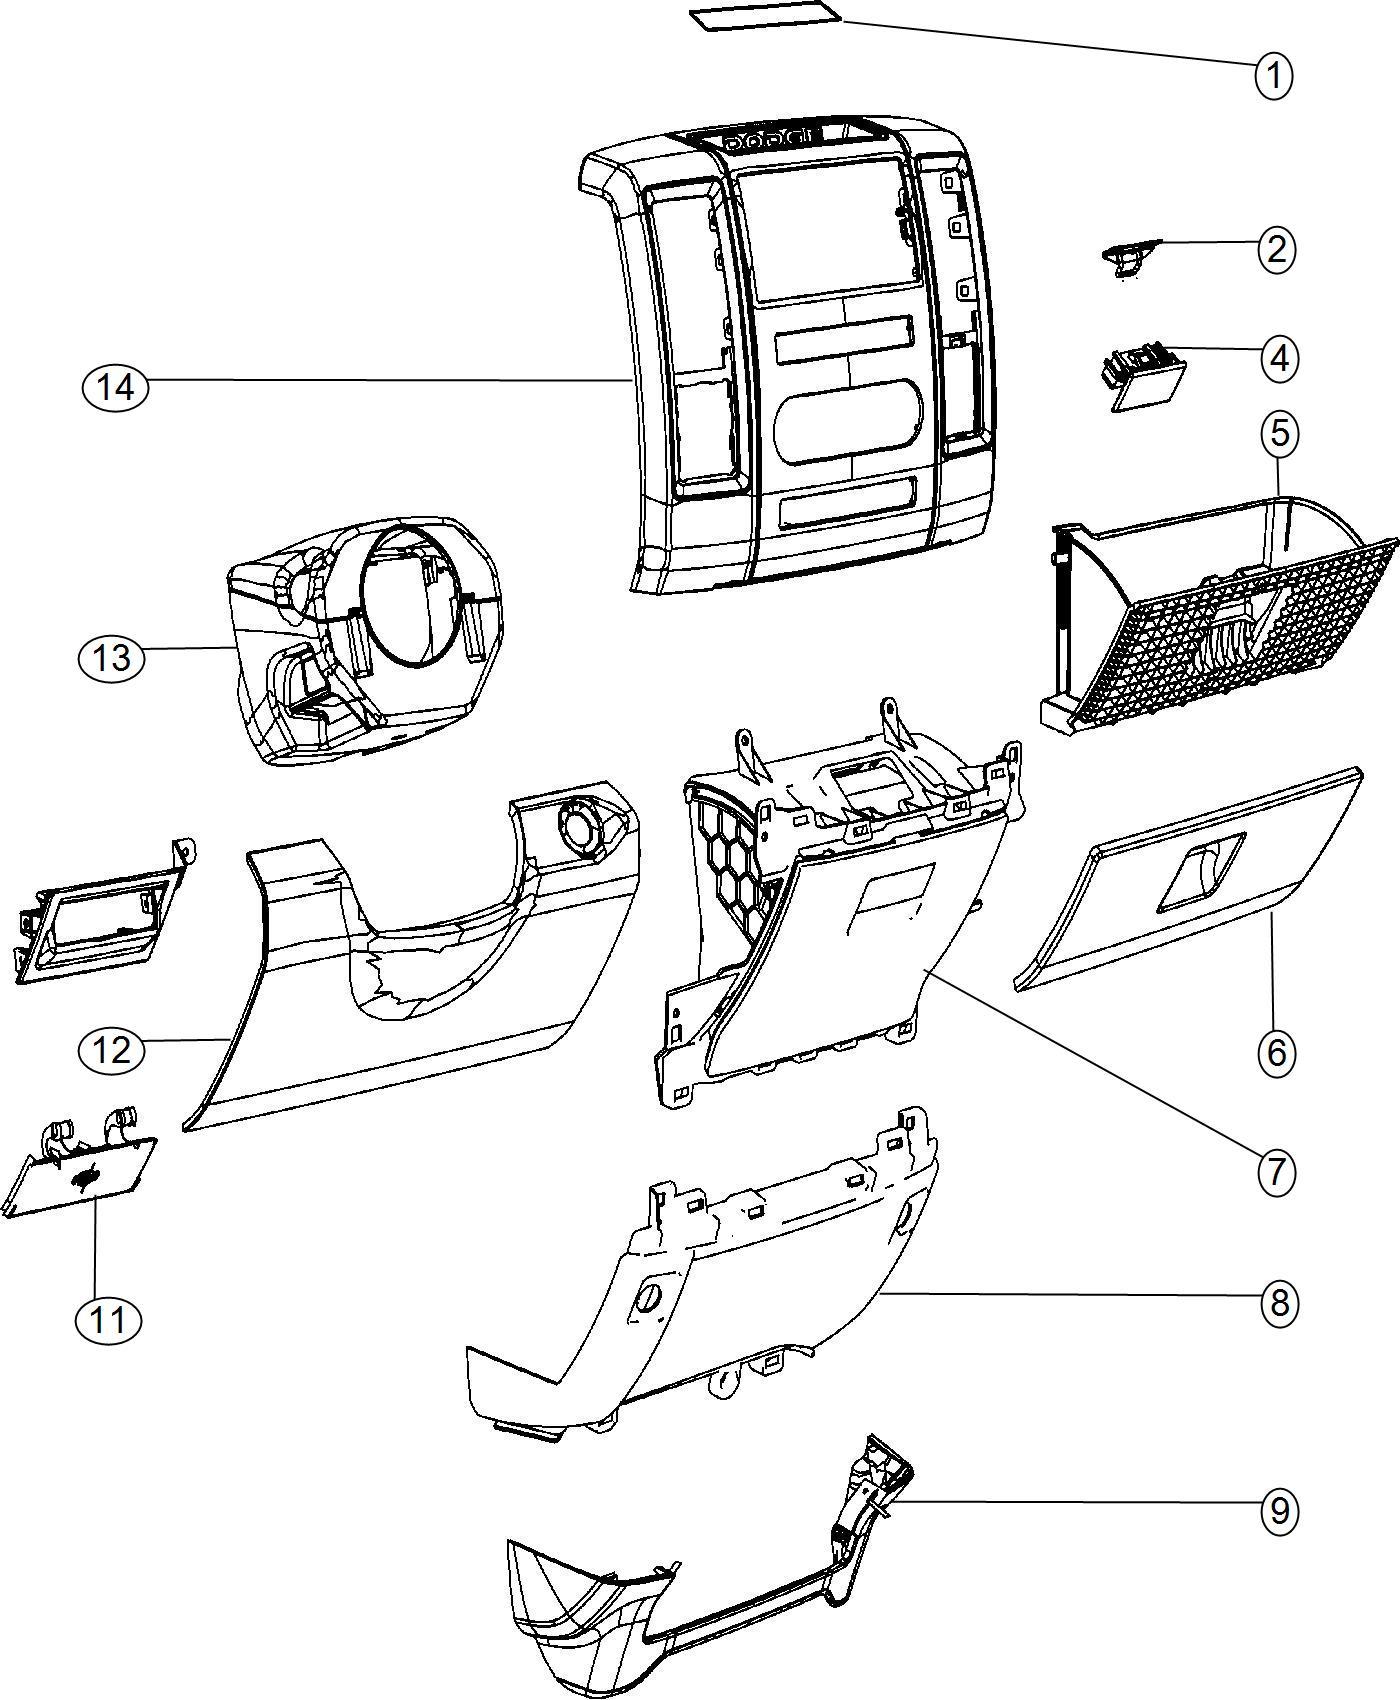 Ram Upfitter Fuse Box